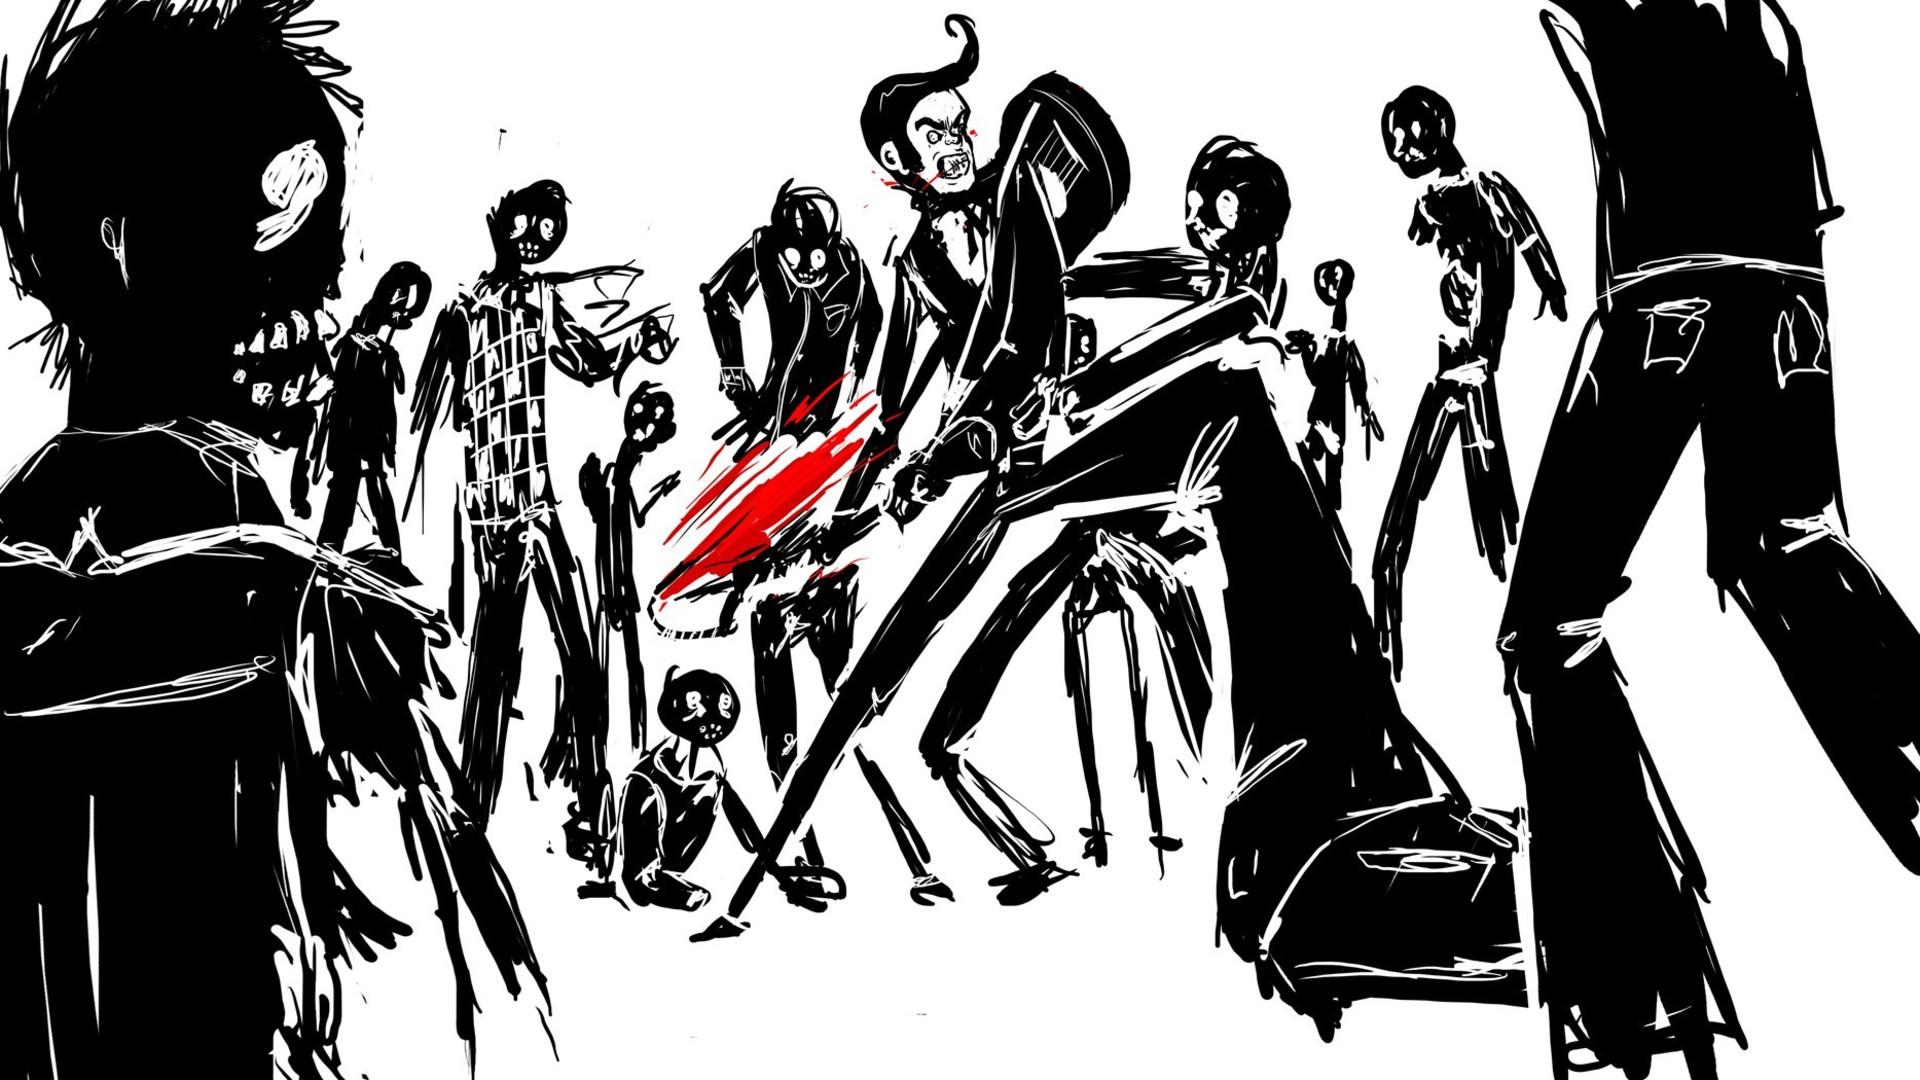 Drawn wallpaper #11008 drawn  resolutions Wallpaper